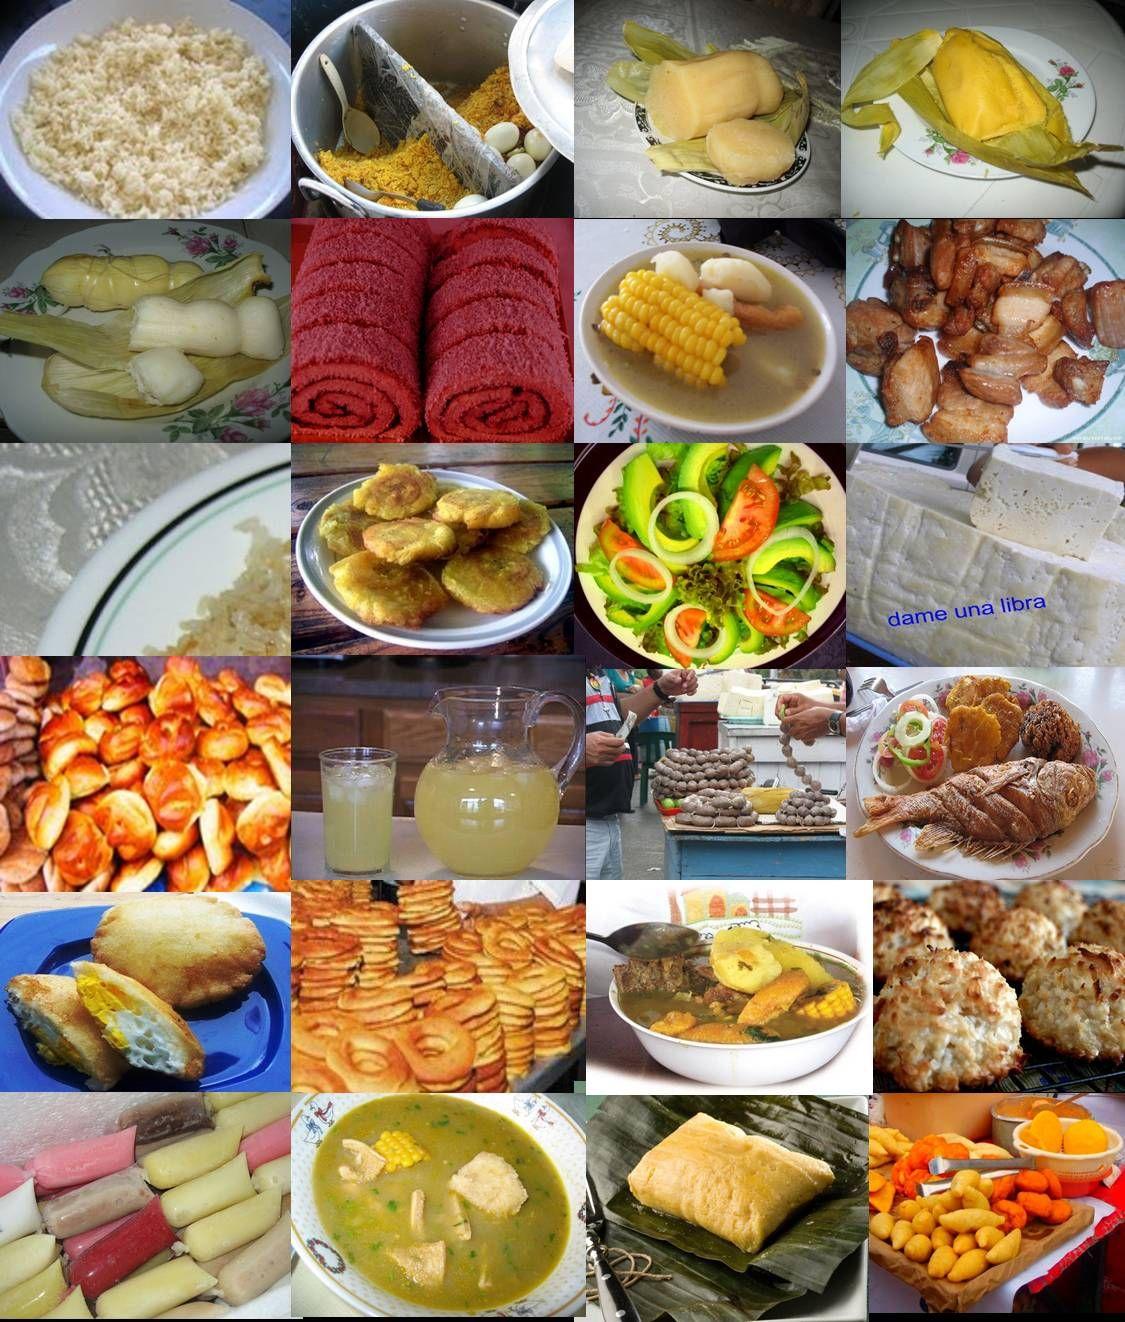 Comida Panameña, Panamanian Food www.CoolPanama.com